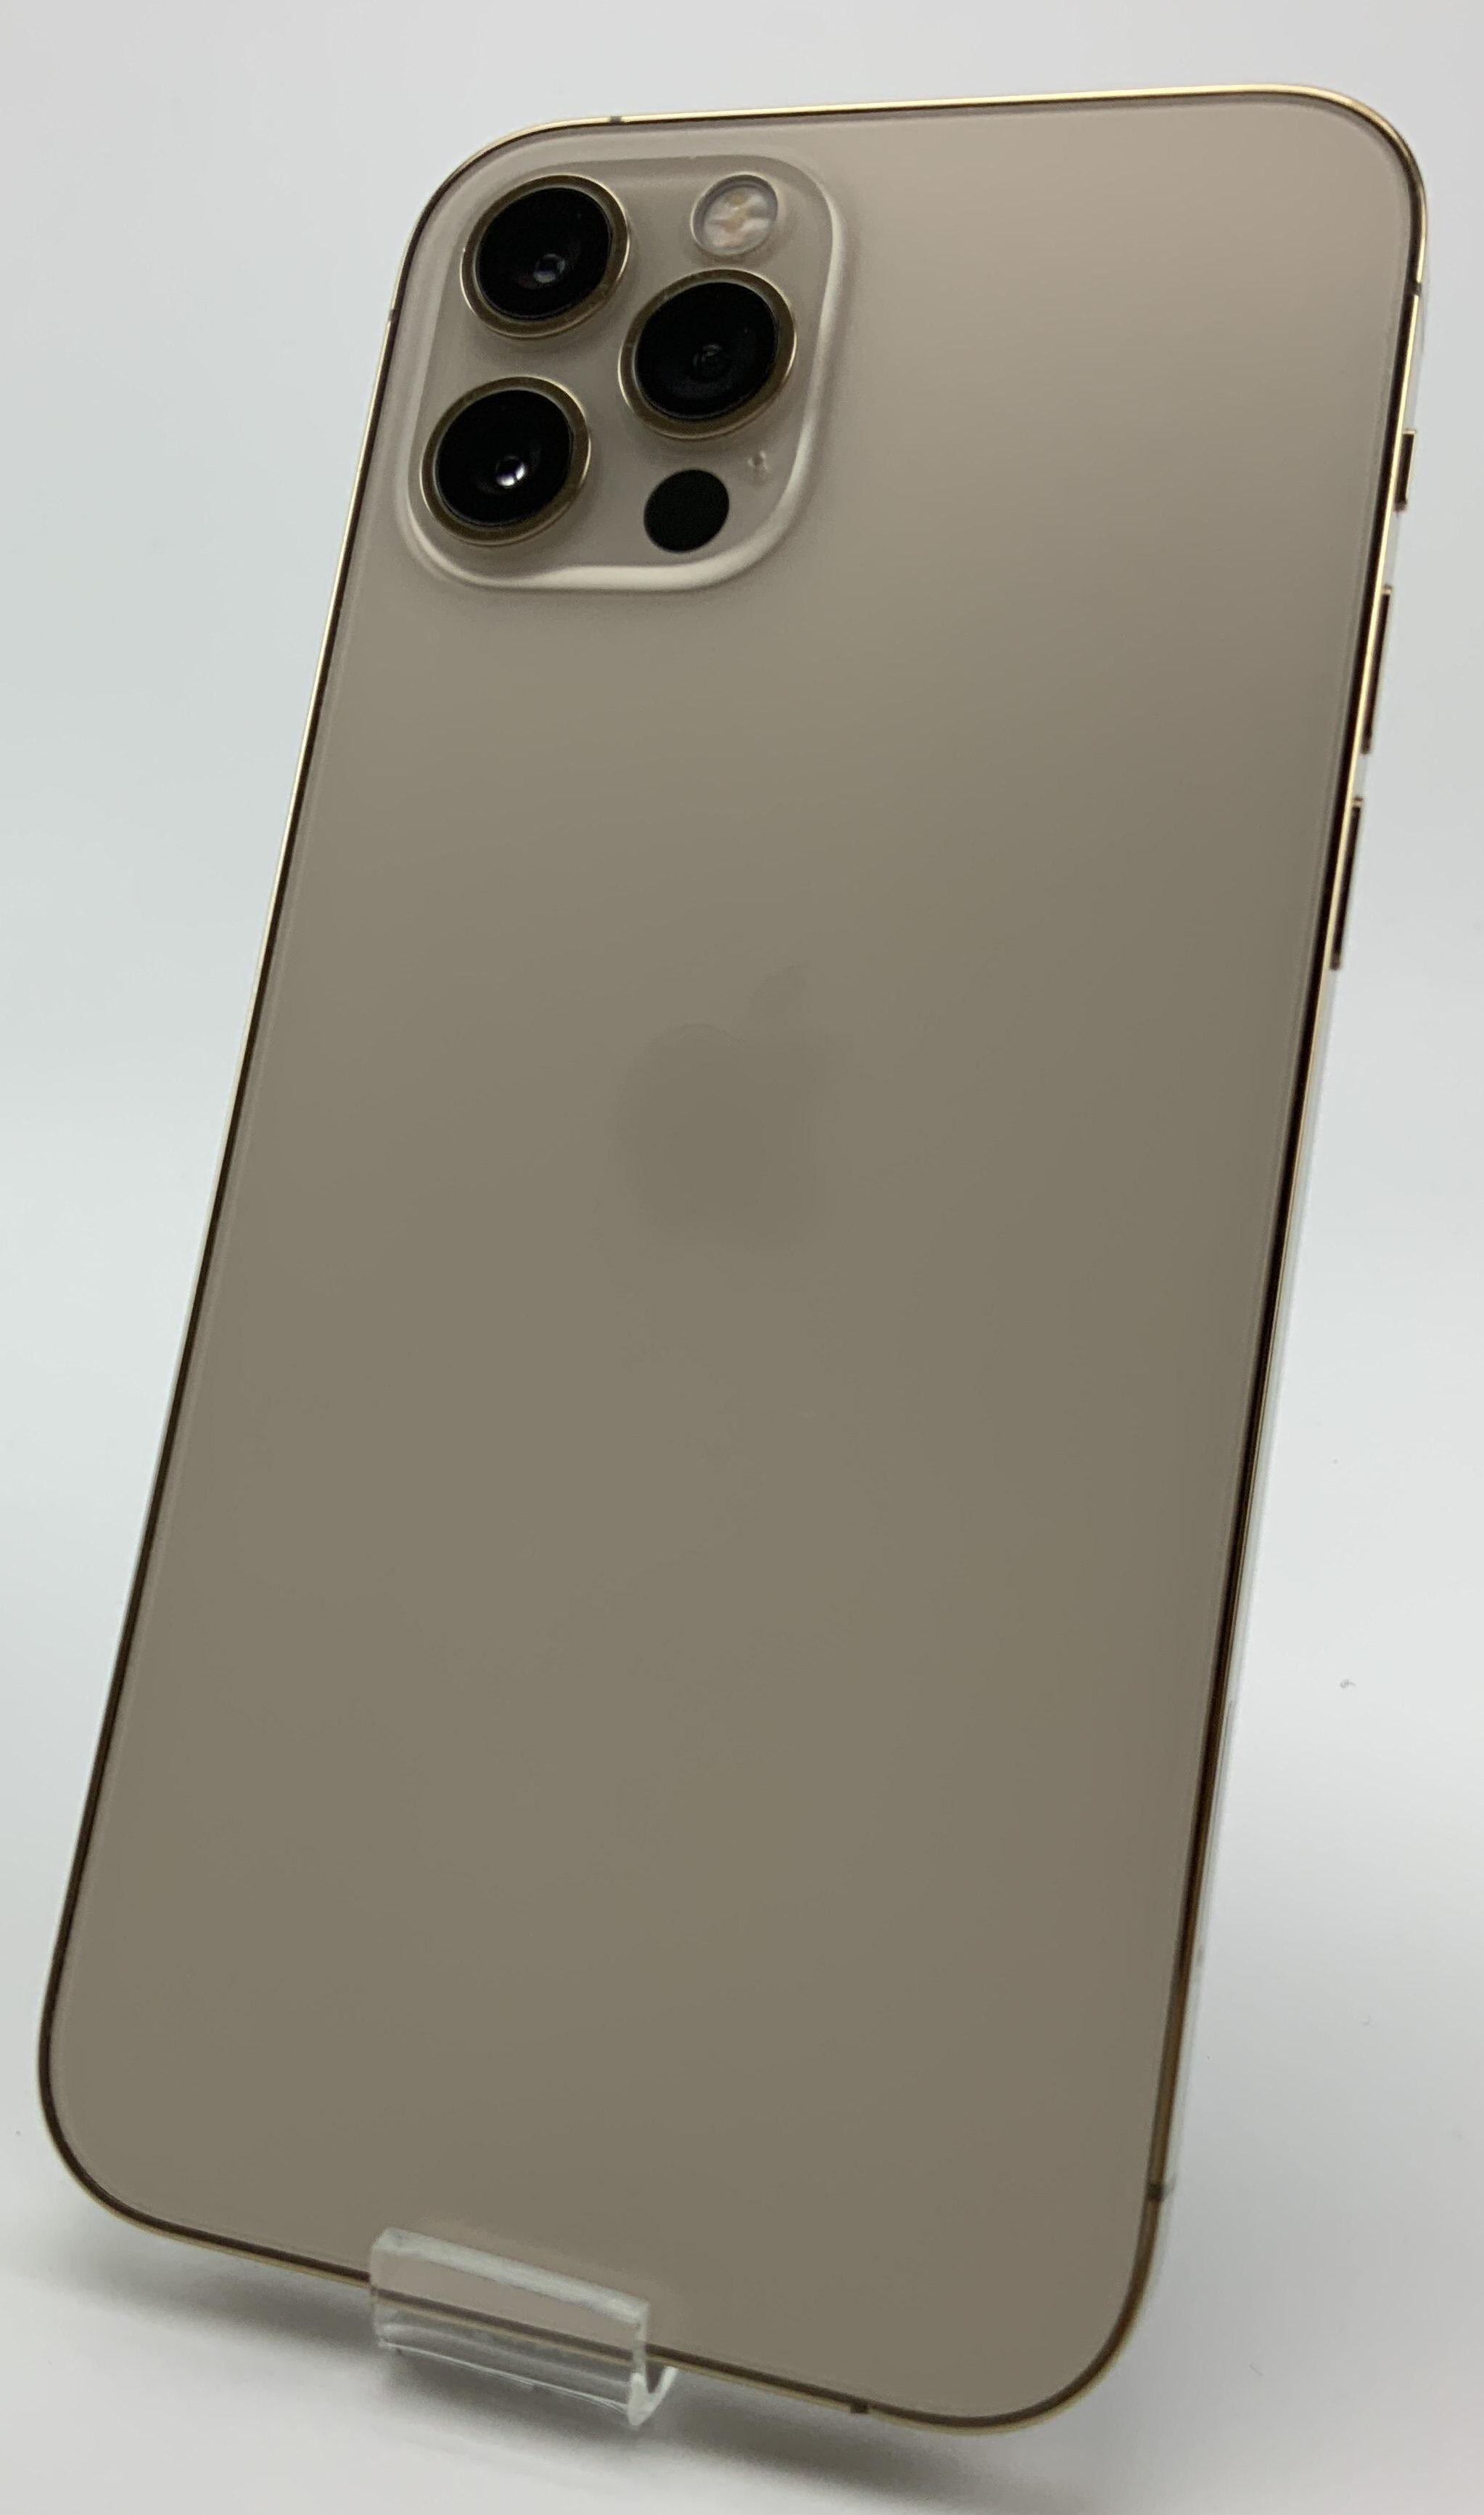 iPhone 12 Pro 128GB, 128GB, Gold, Bild 2